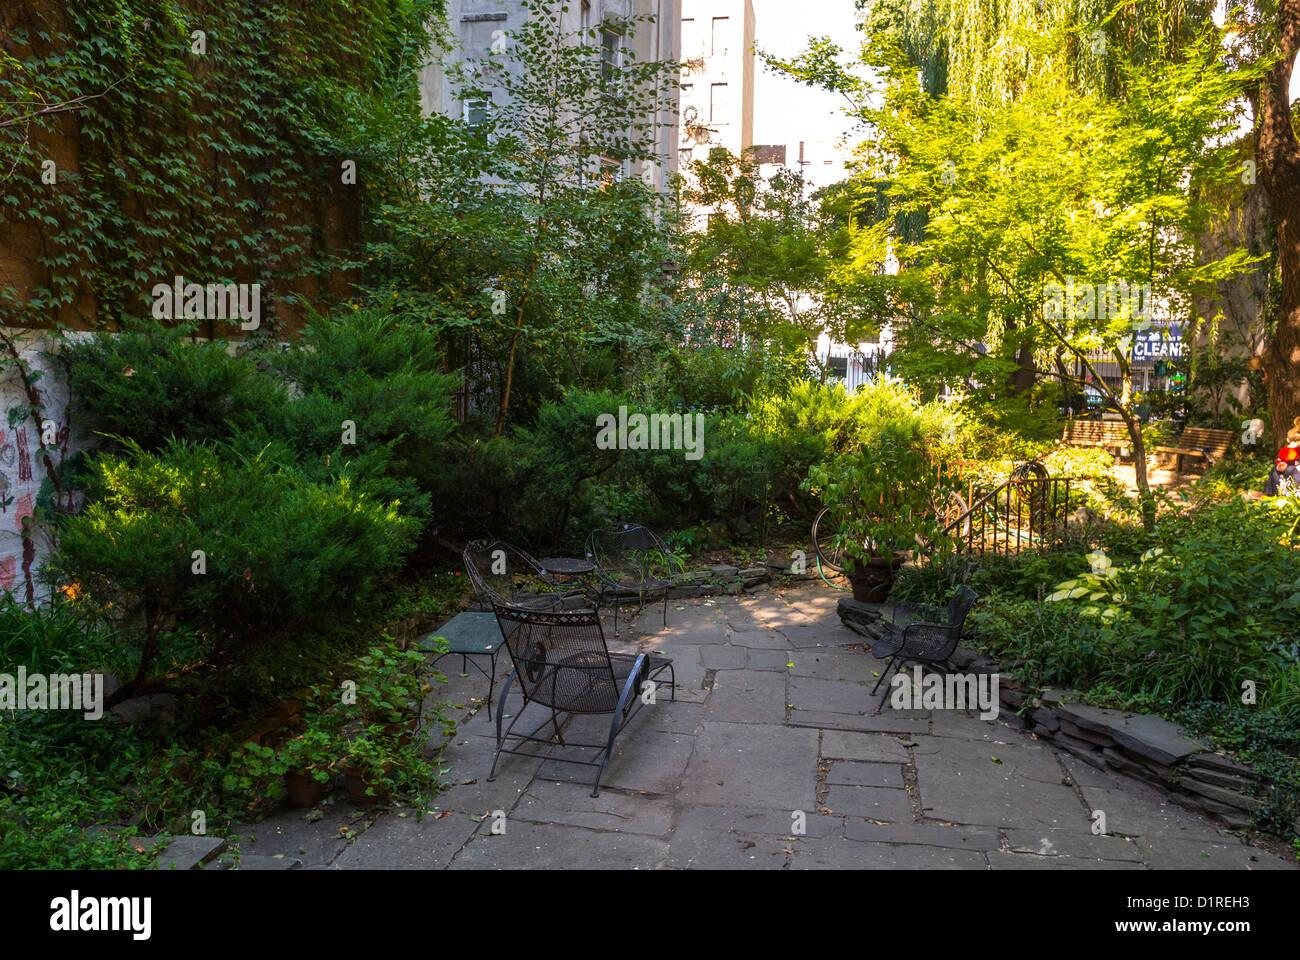 New York, NY, USA,  East Village 'Miracle Garden' Community Gardens, Scenes, Local neighbourhoods - Stock Image